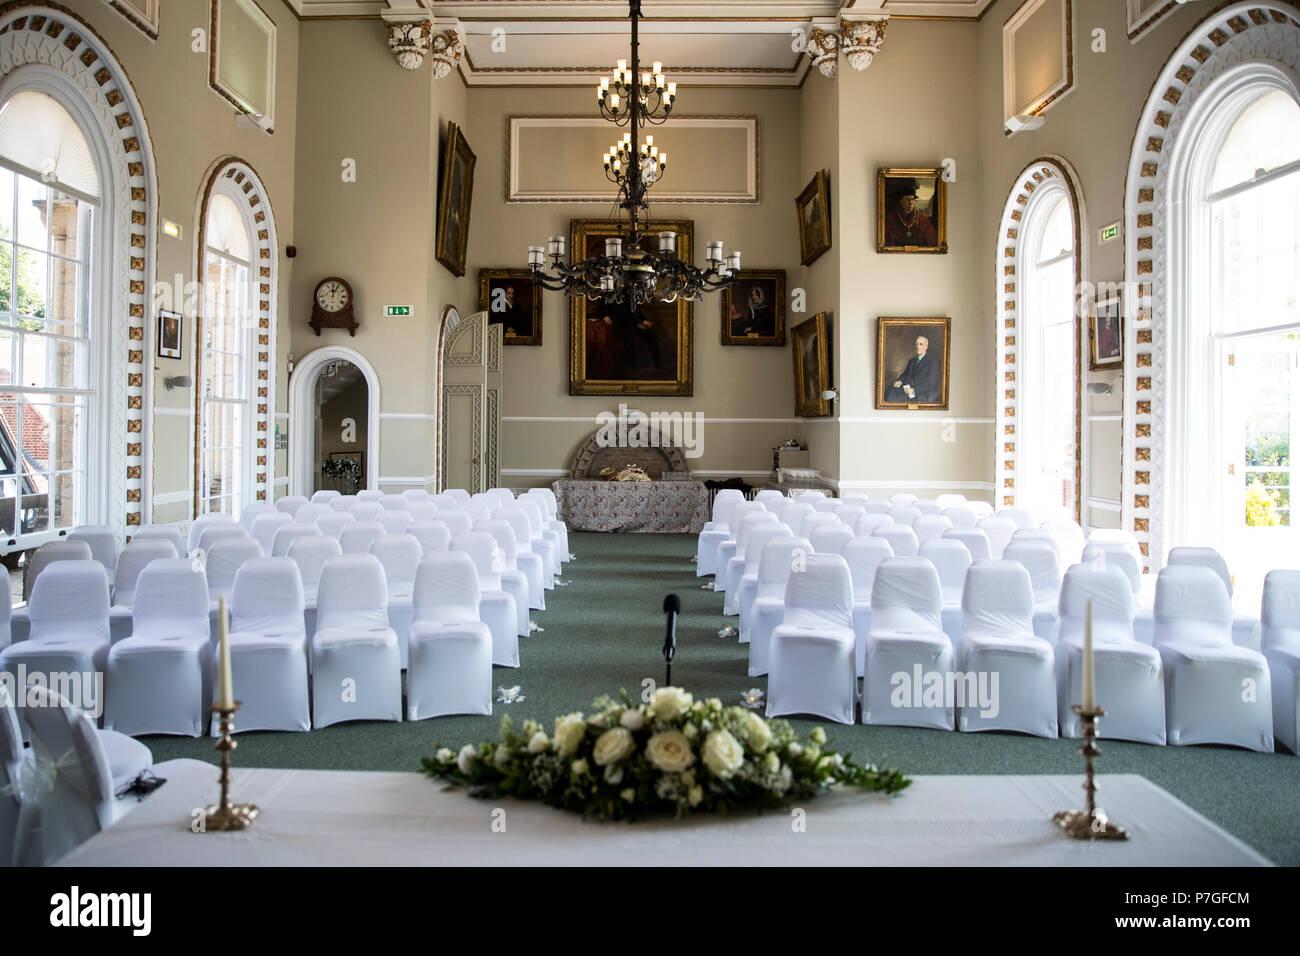 Arundel Town Hall, Arundel, West Sussex - Stock Image